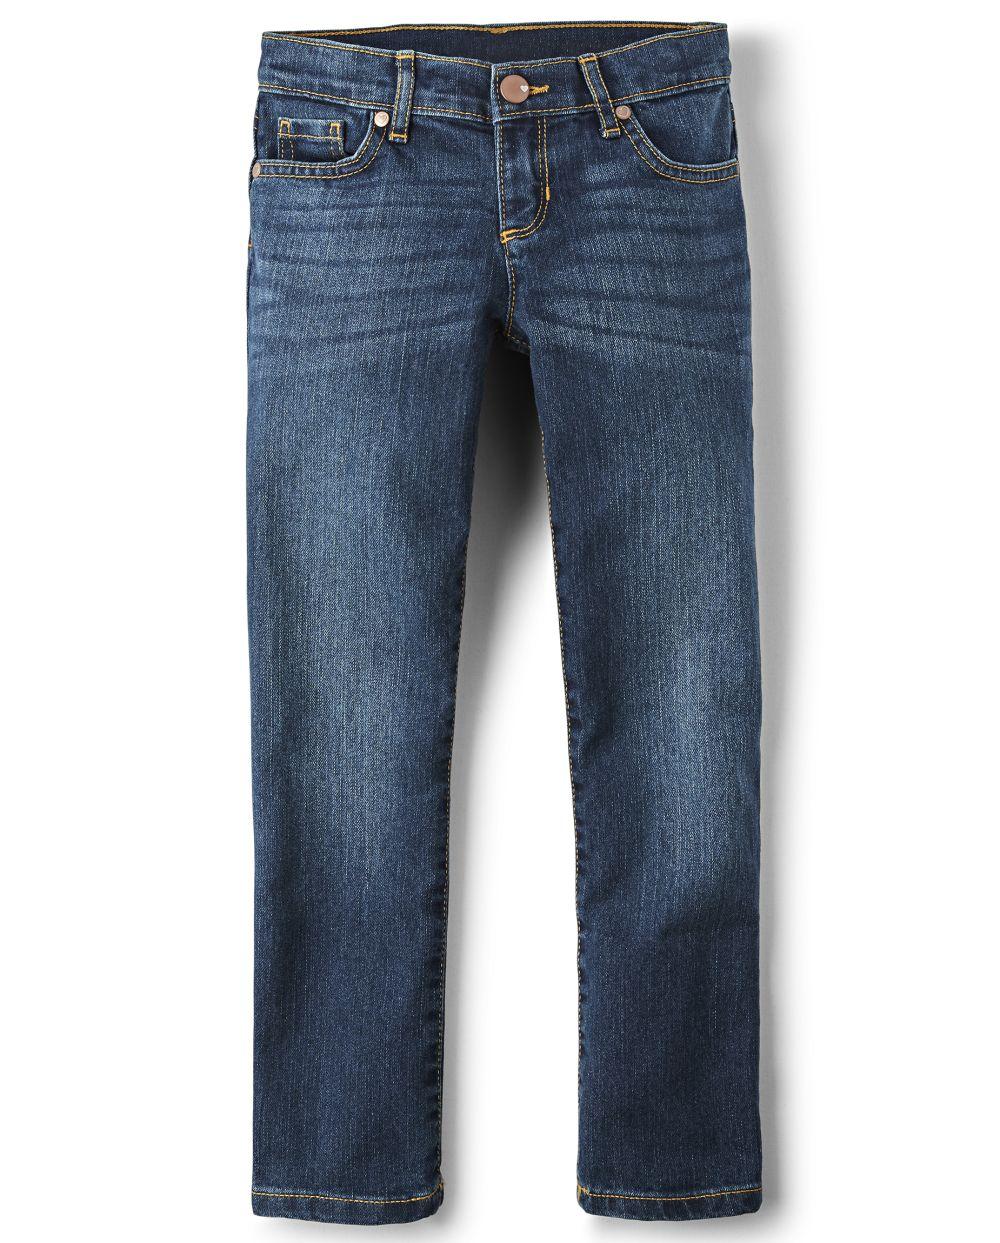 Girls Basic Skinny Jeans